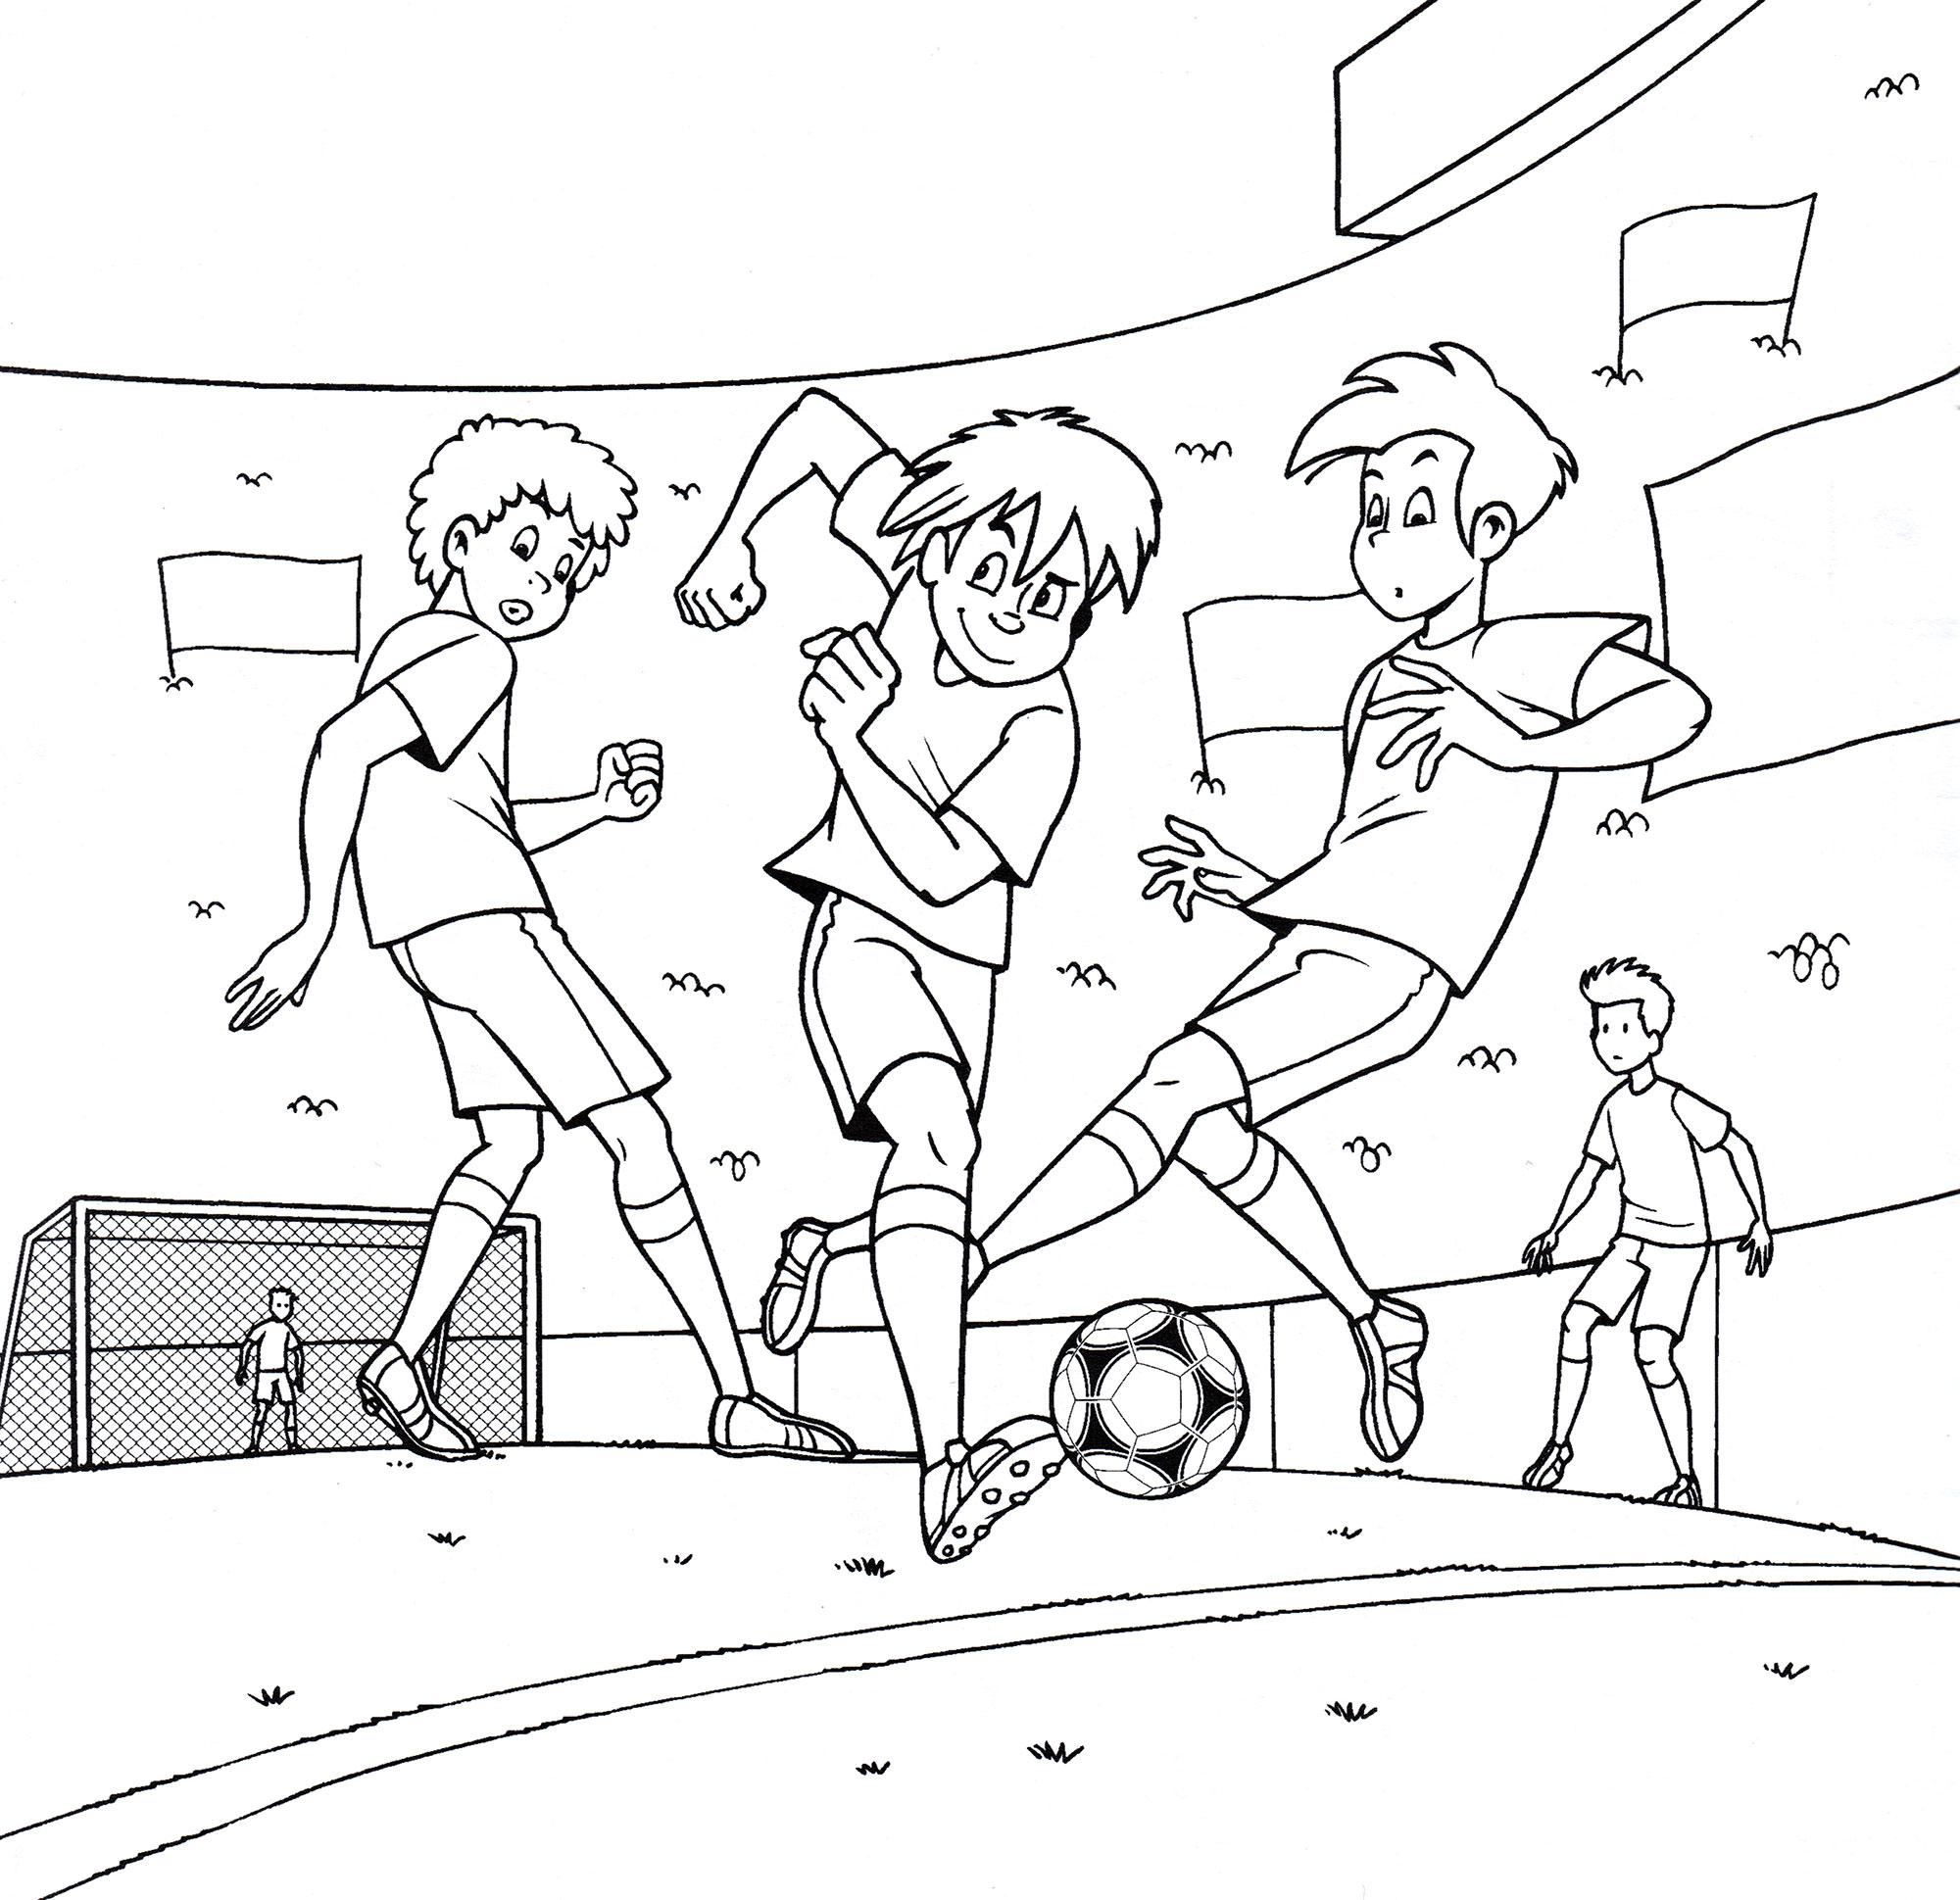 Раскраска Нападающий с мячом | Раскраски футбол